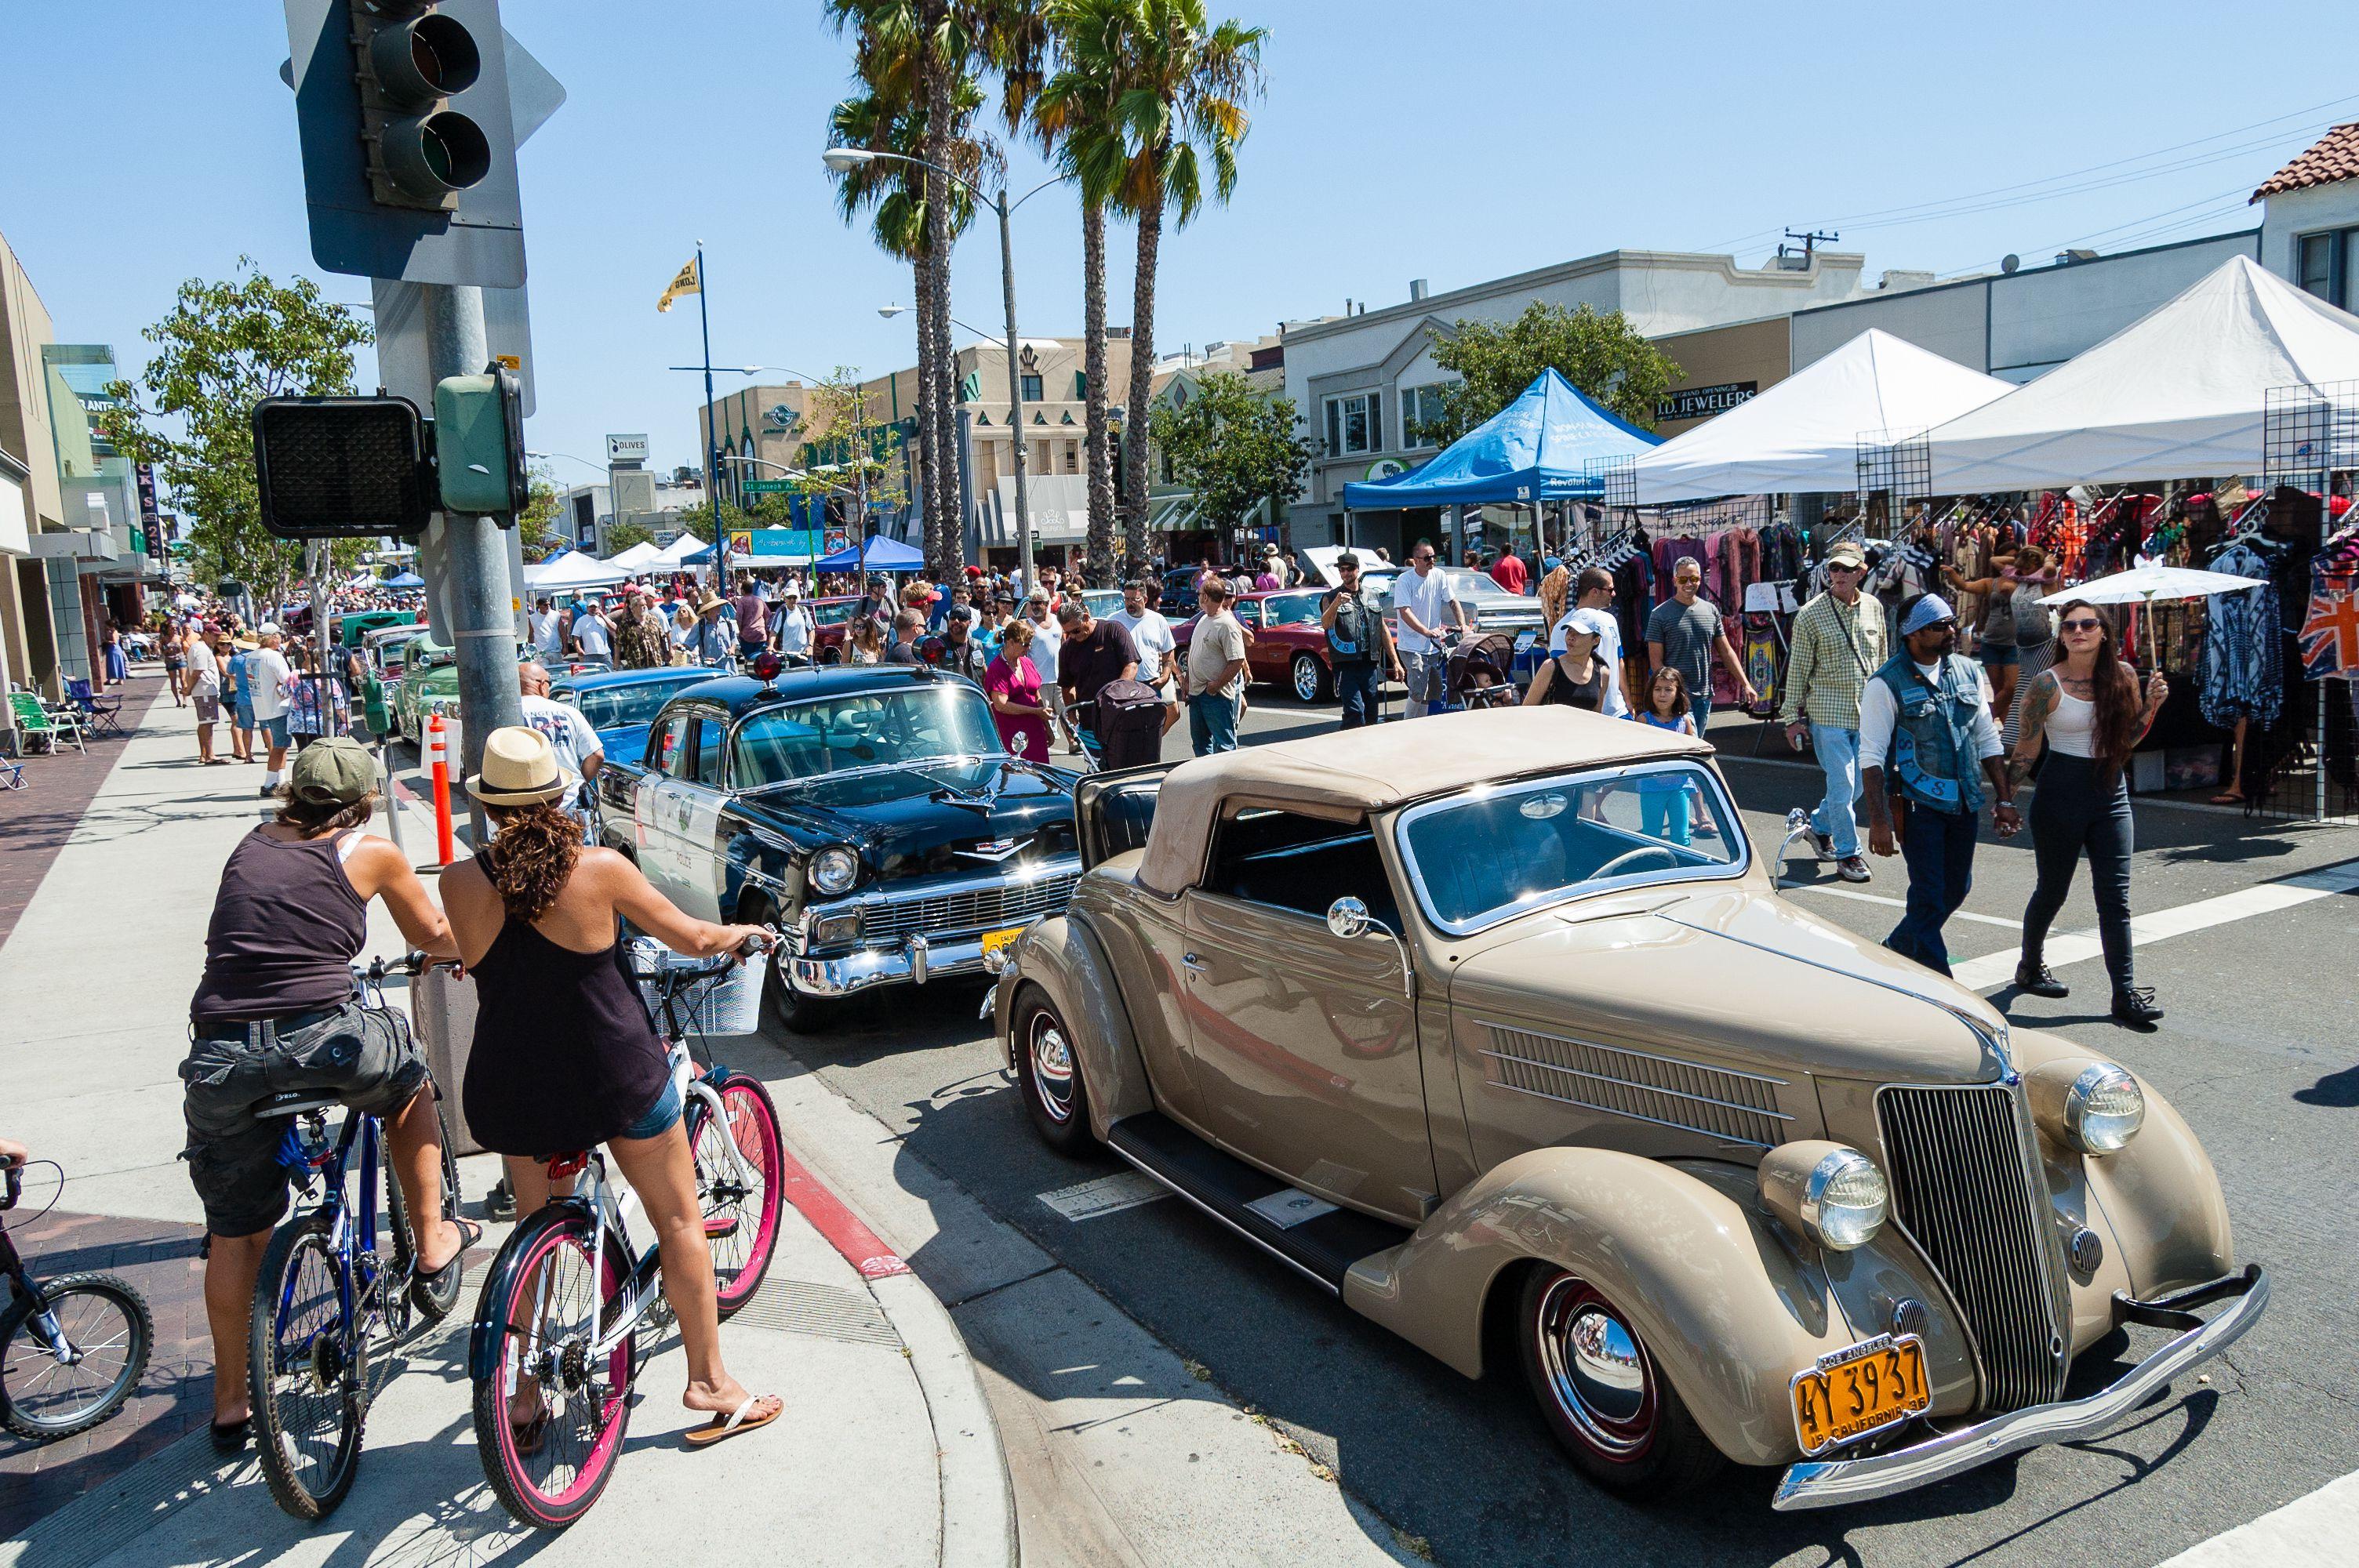 Annual Car Shows In Los Angeles - California car shows